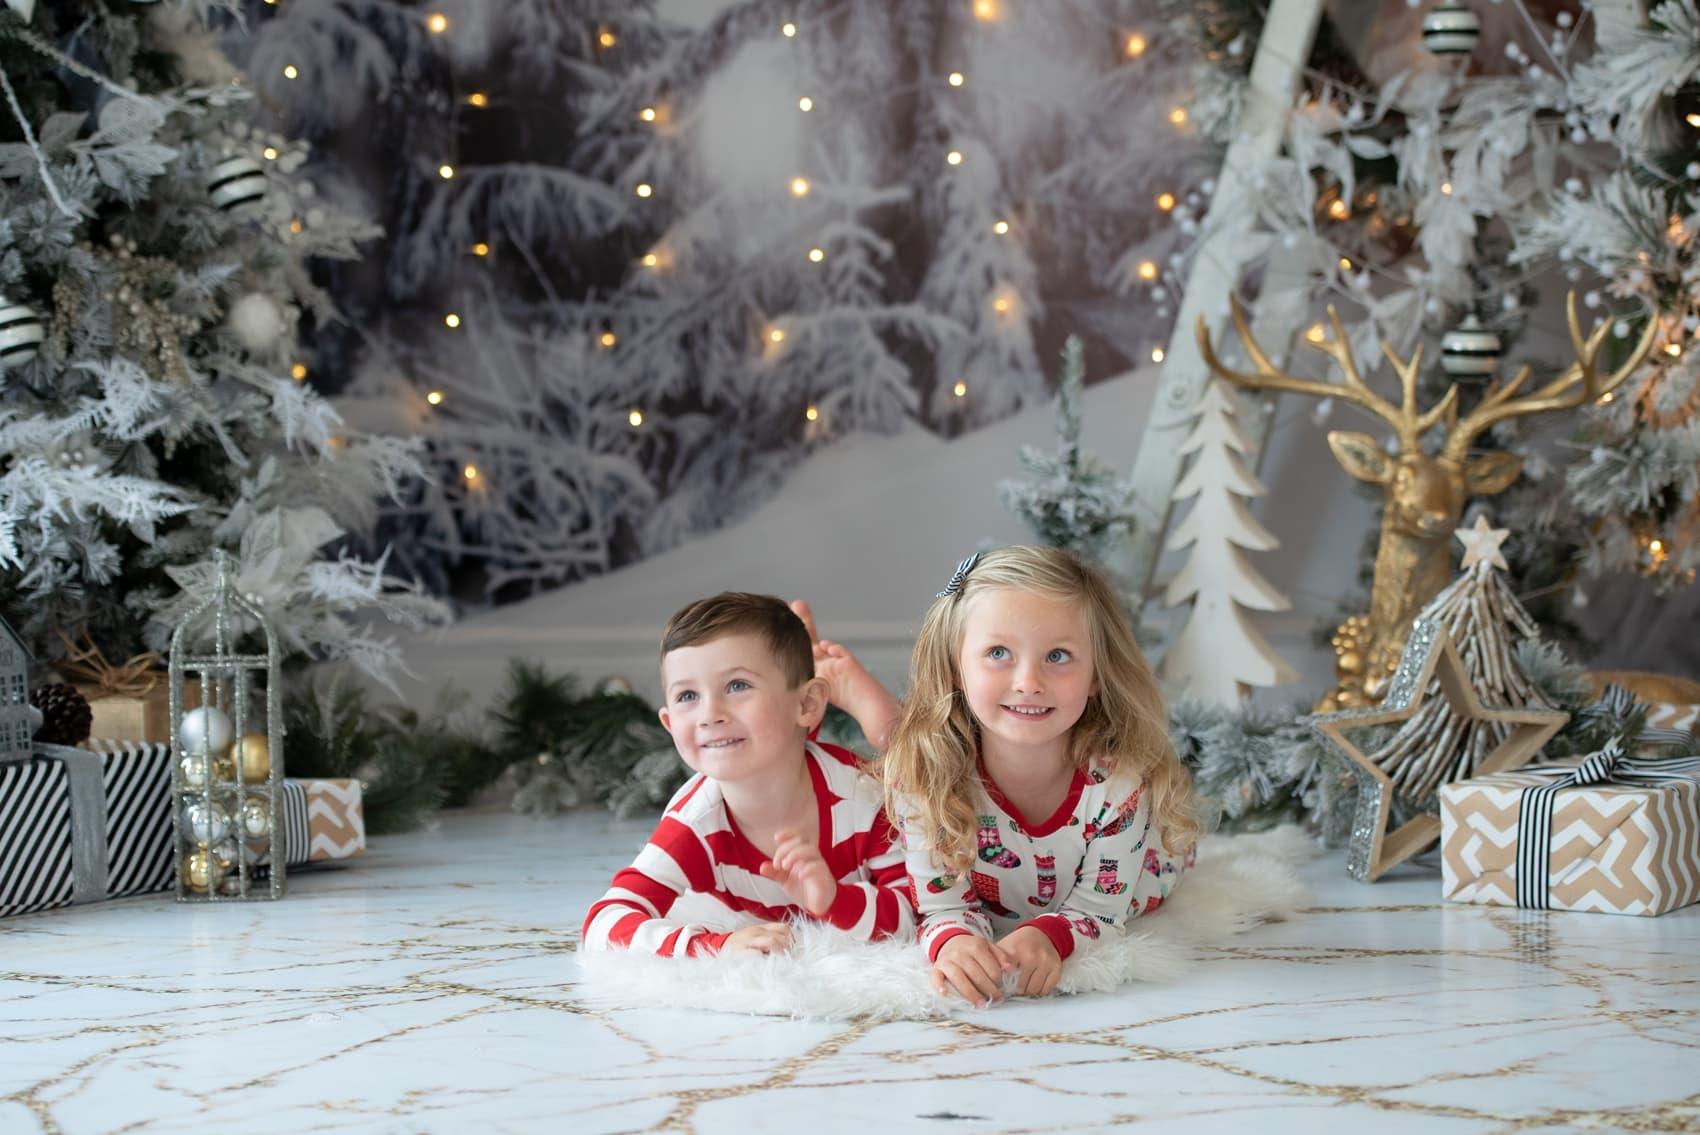 Pictonat_Holiday_Solski_1004_0152_WEB